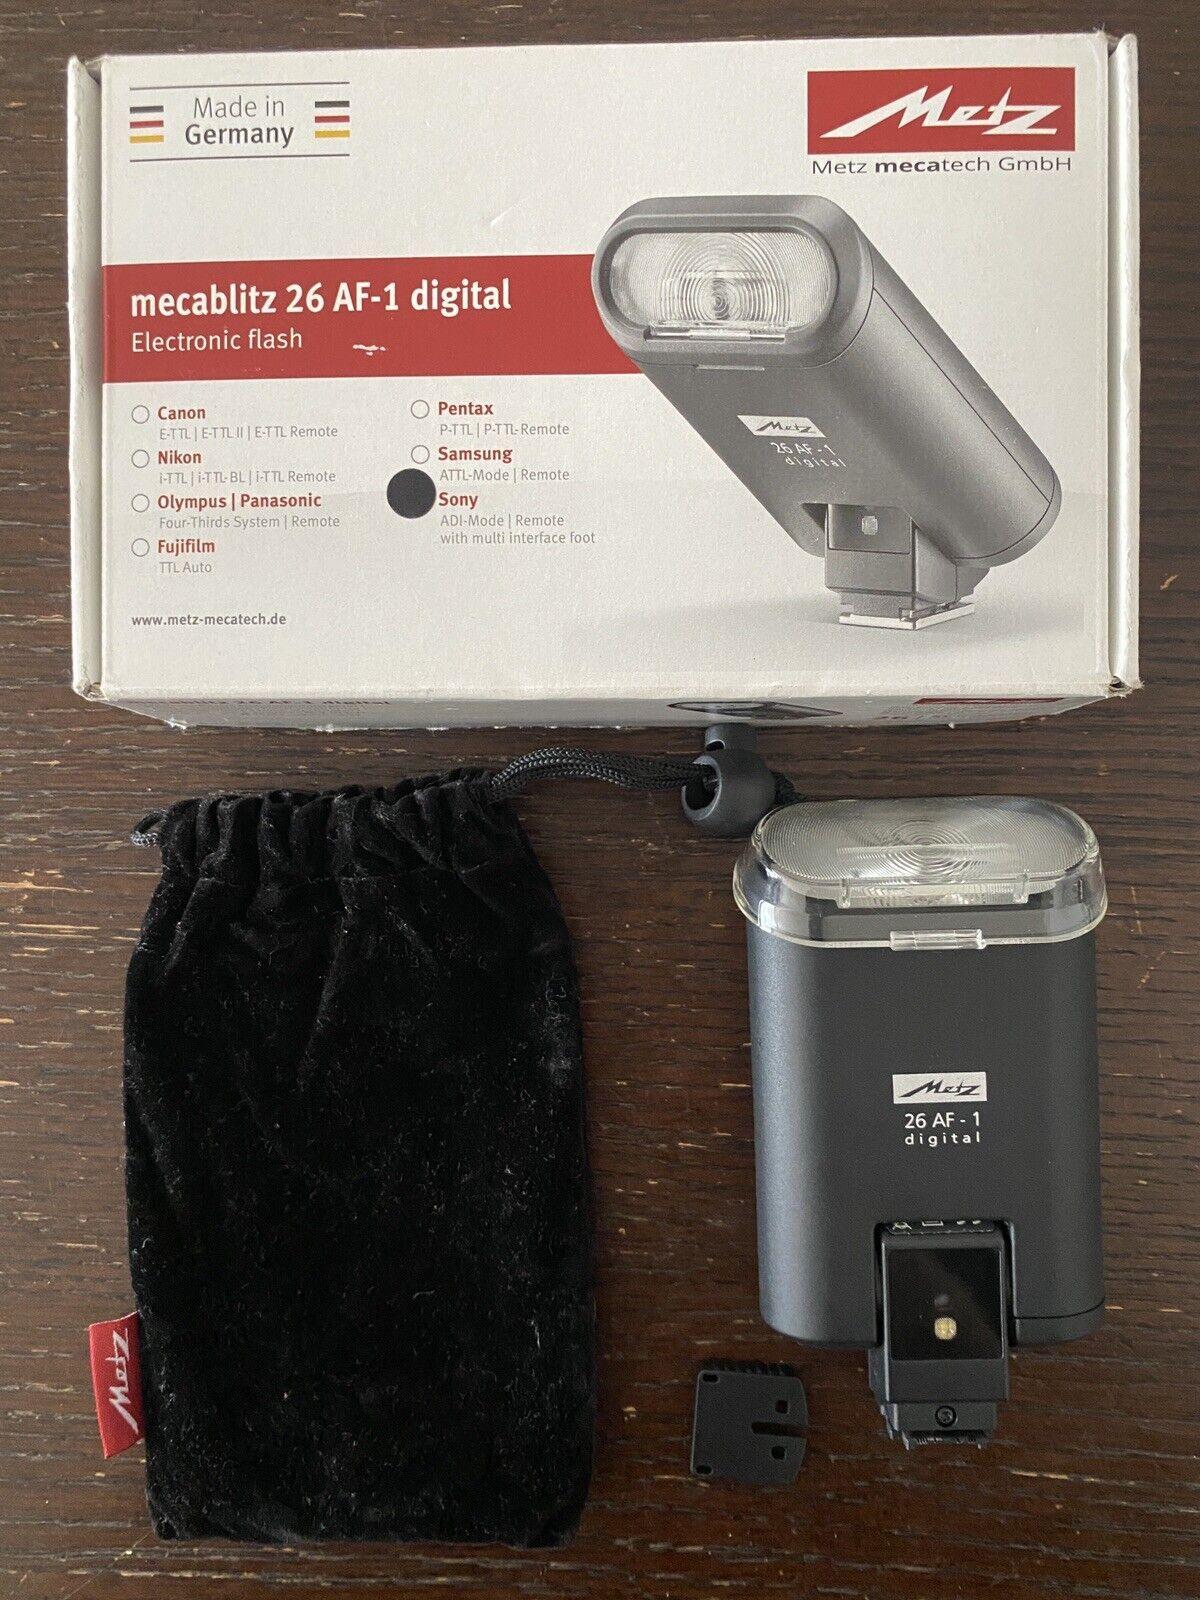 Metz mecablitz 44 AF-2 Digital Flash for Nikon i-TTL Cameras